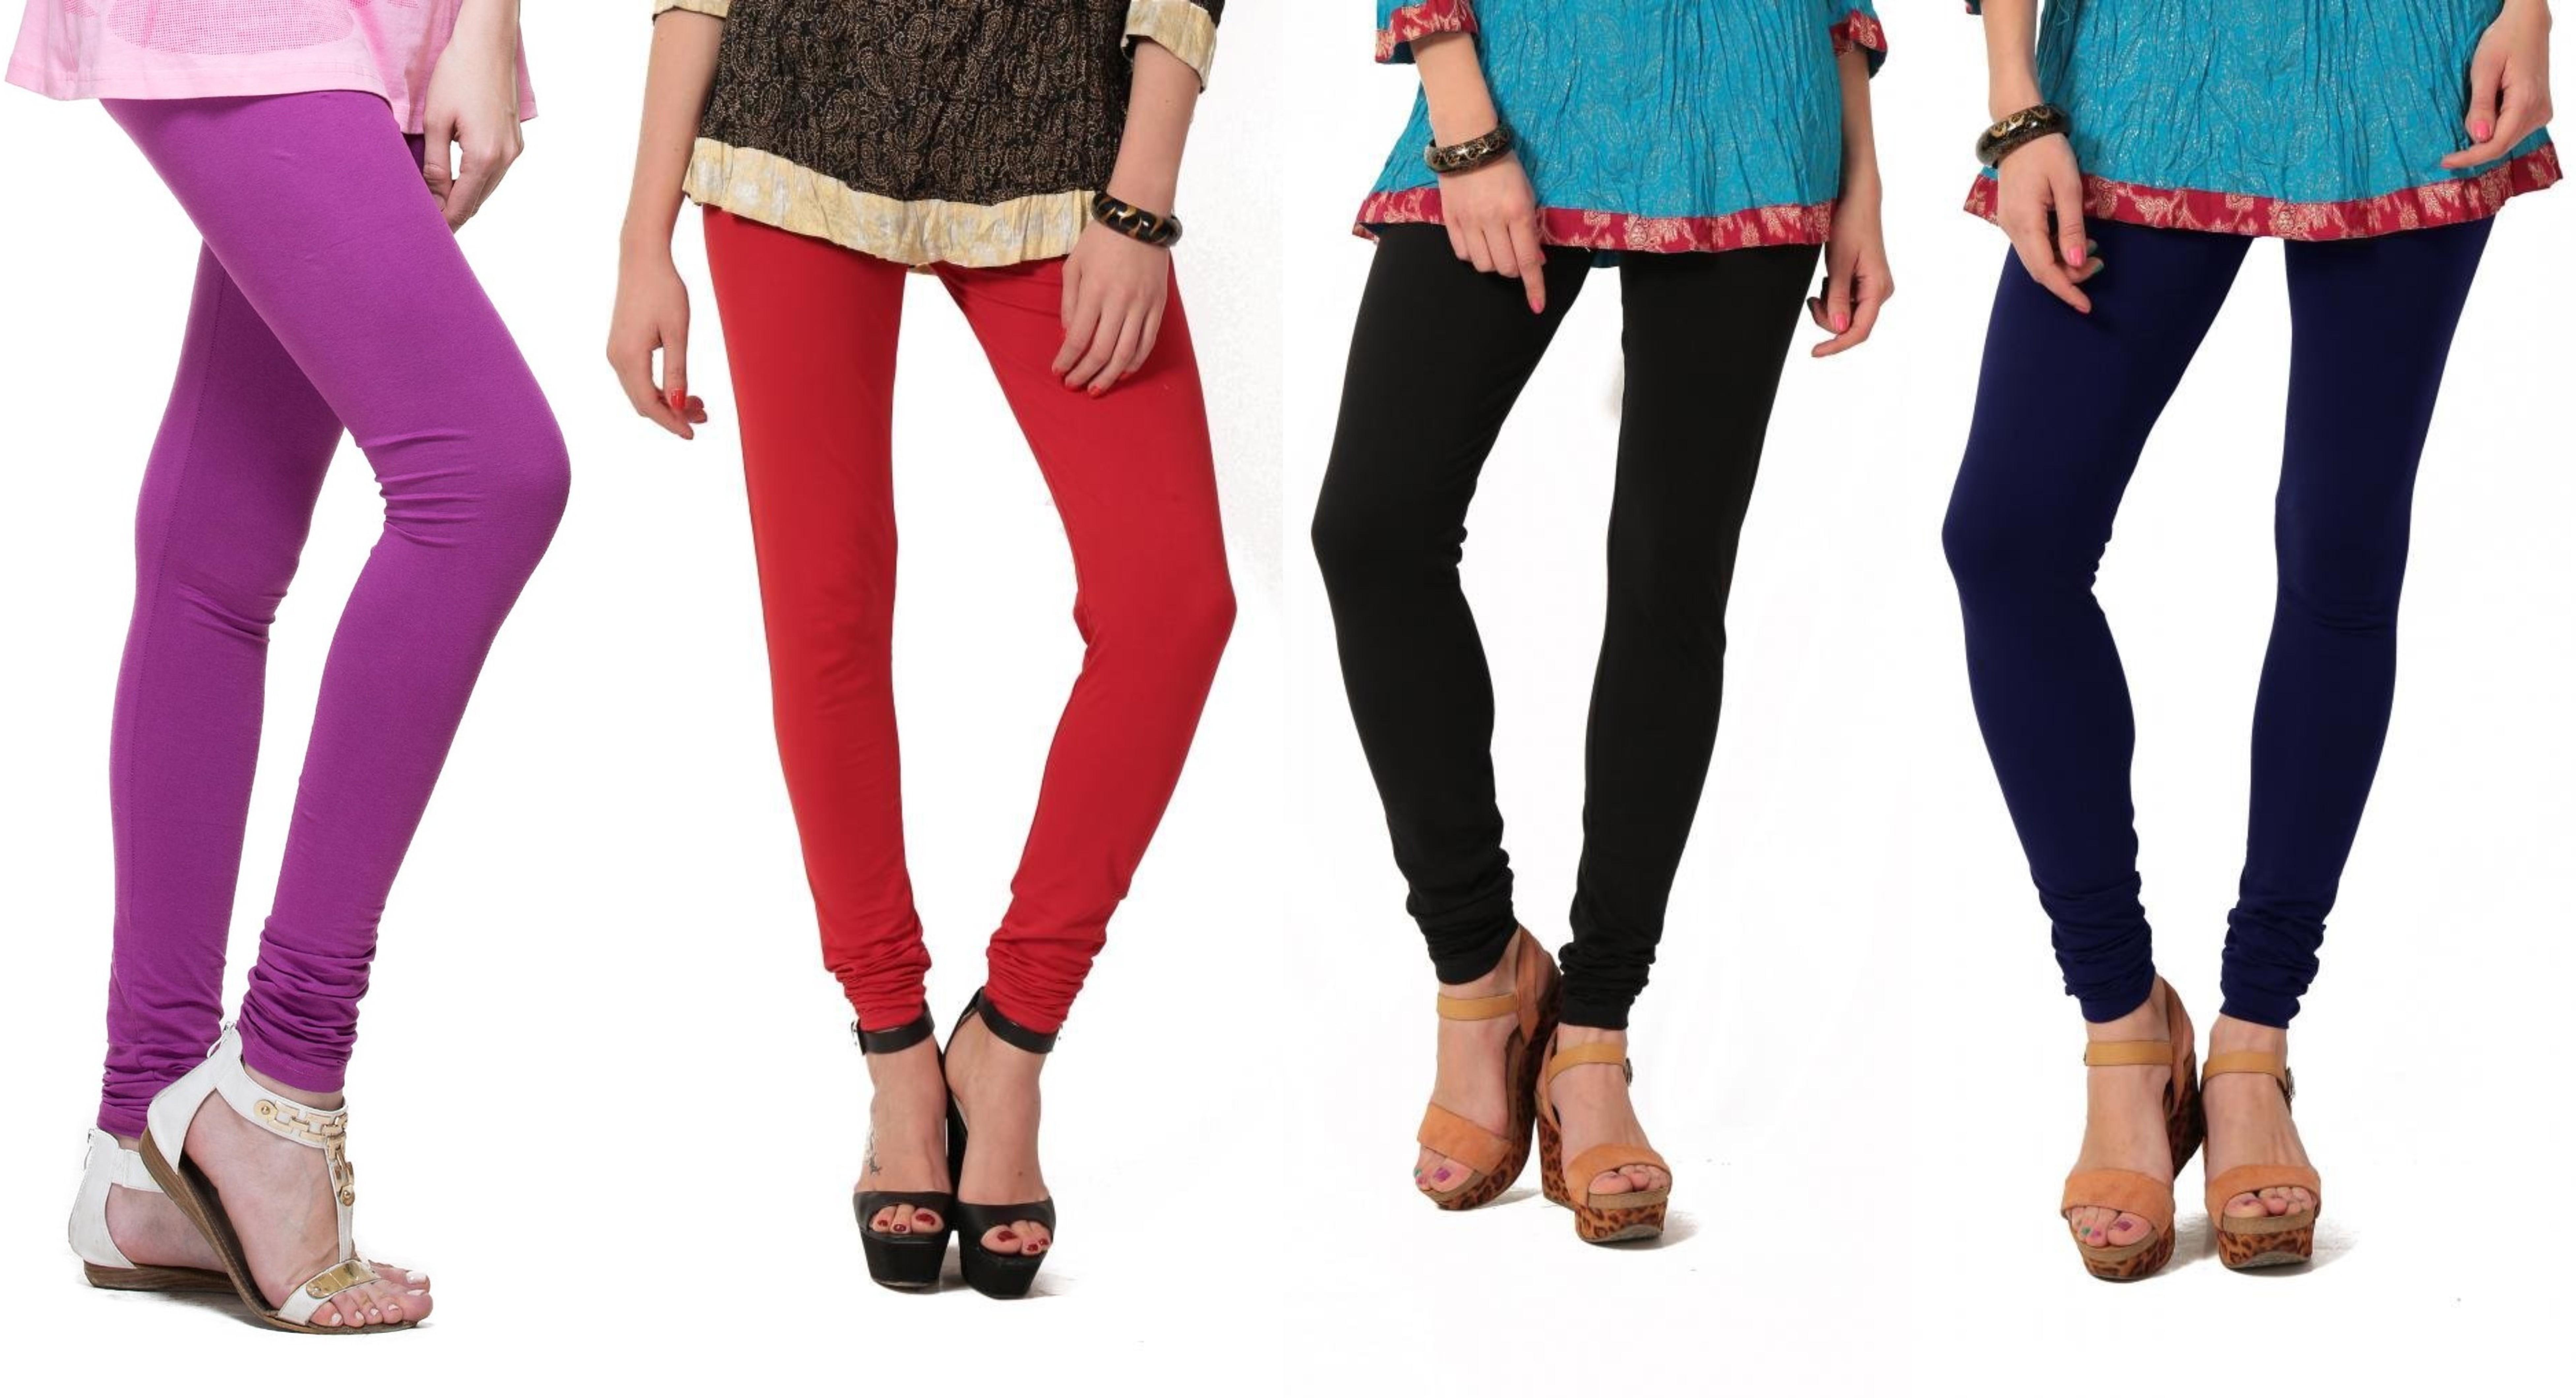 Angel Soft Womens Purple, Red, Black, Blue Leggings(Pack of 4)